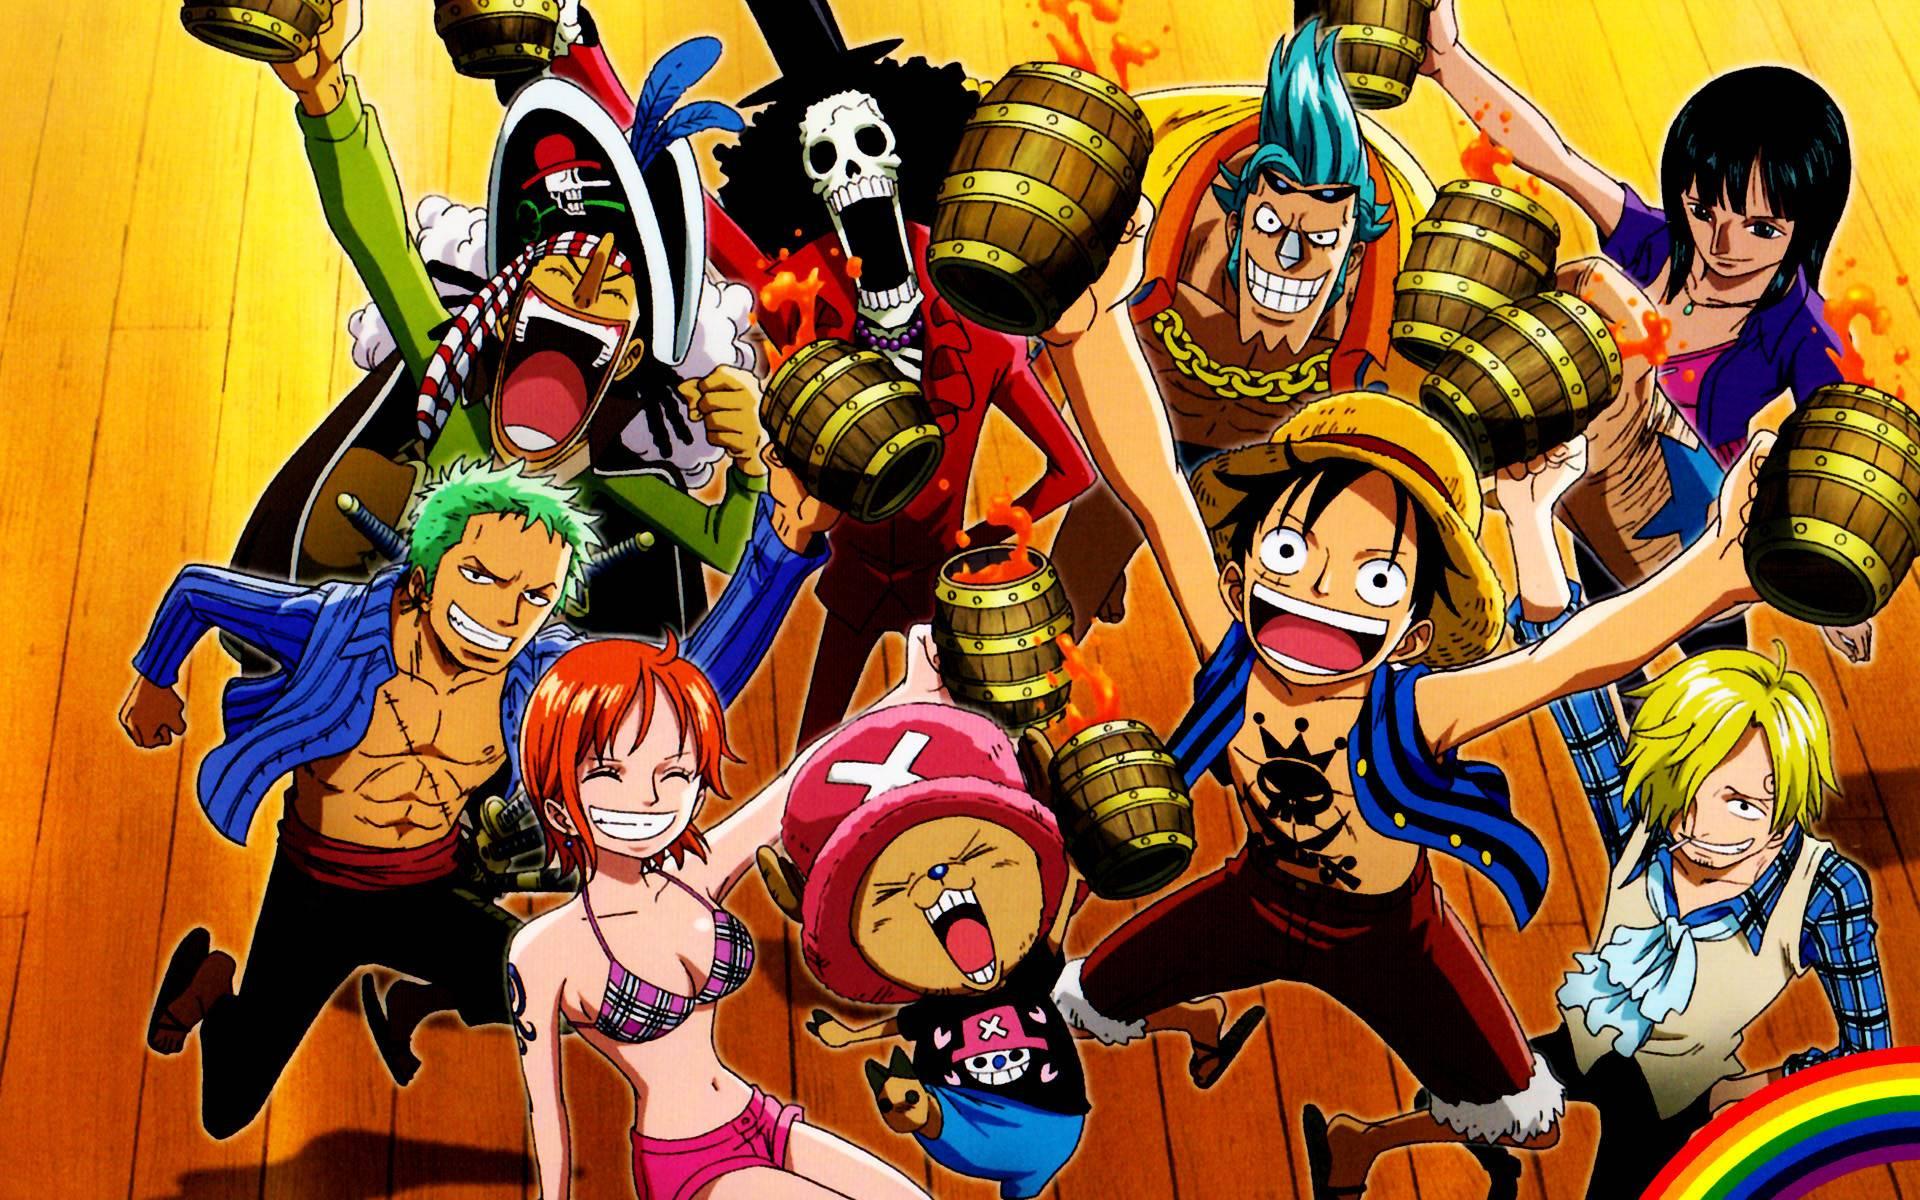 One Piece Anime Desktop Wallpapers Top Free One Piece Anime Desktop Backgrounds Wallpaperaccess